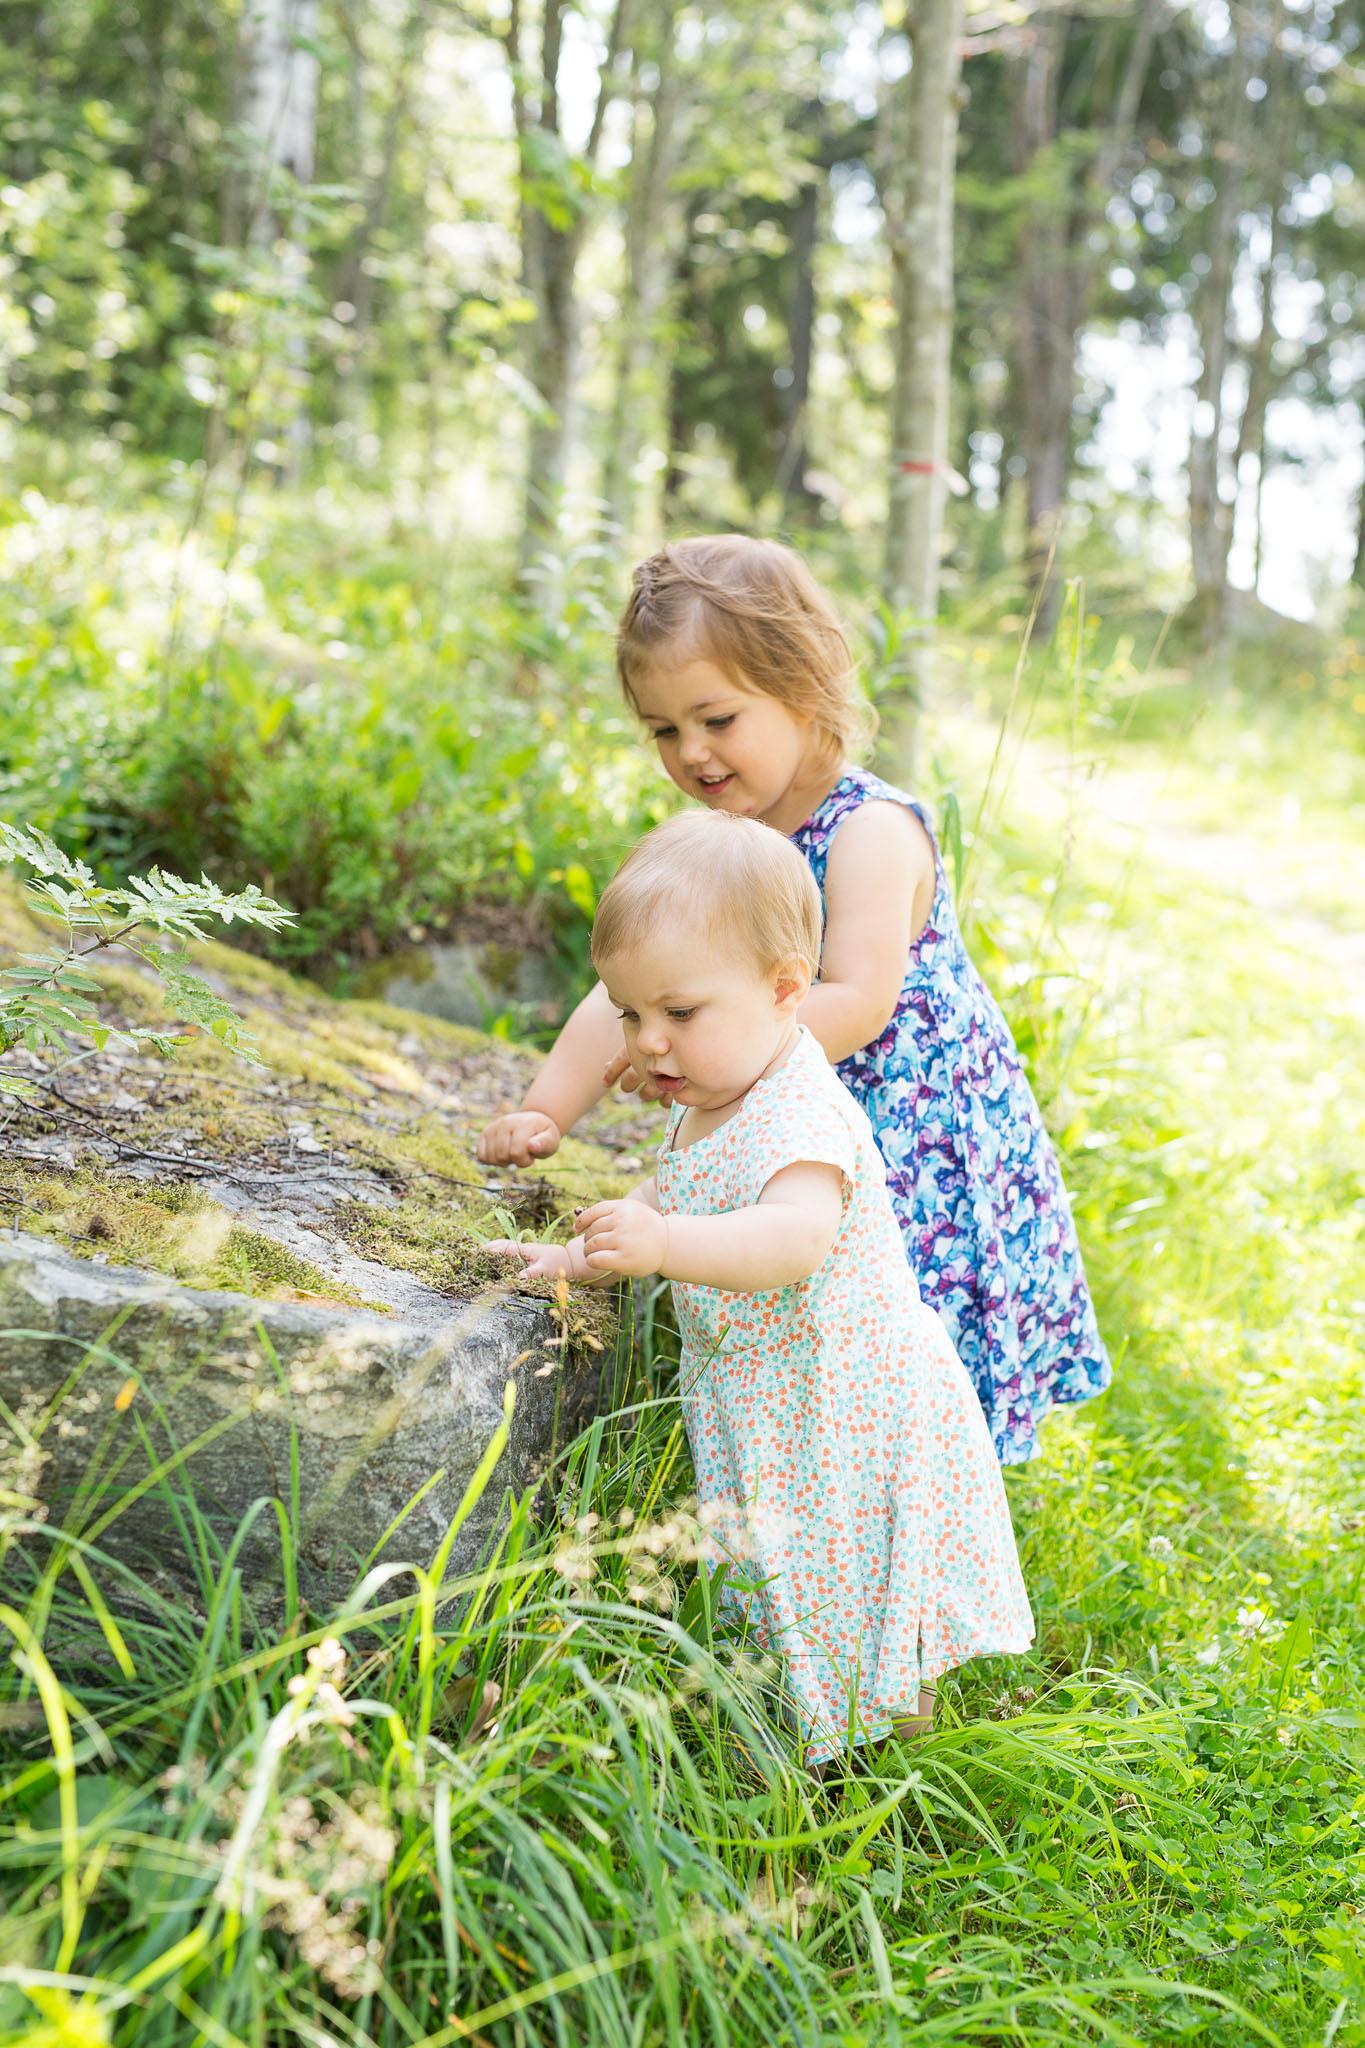 fotograf_sabina_wixner_barn_familj_hudiksvall_6.jpg